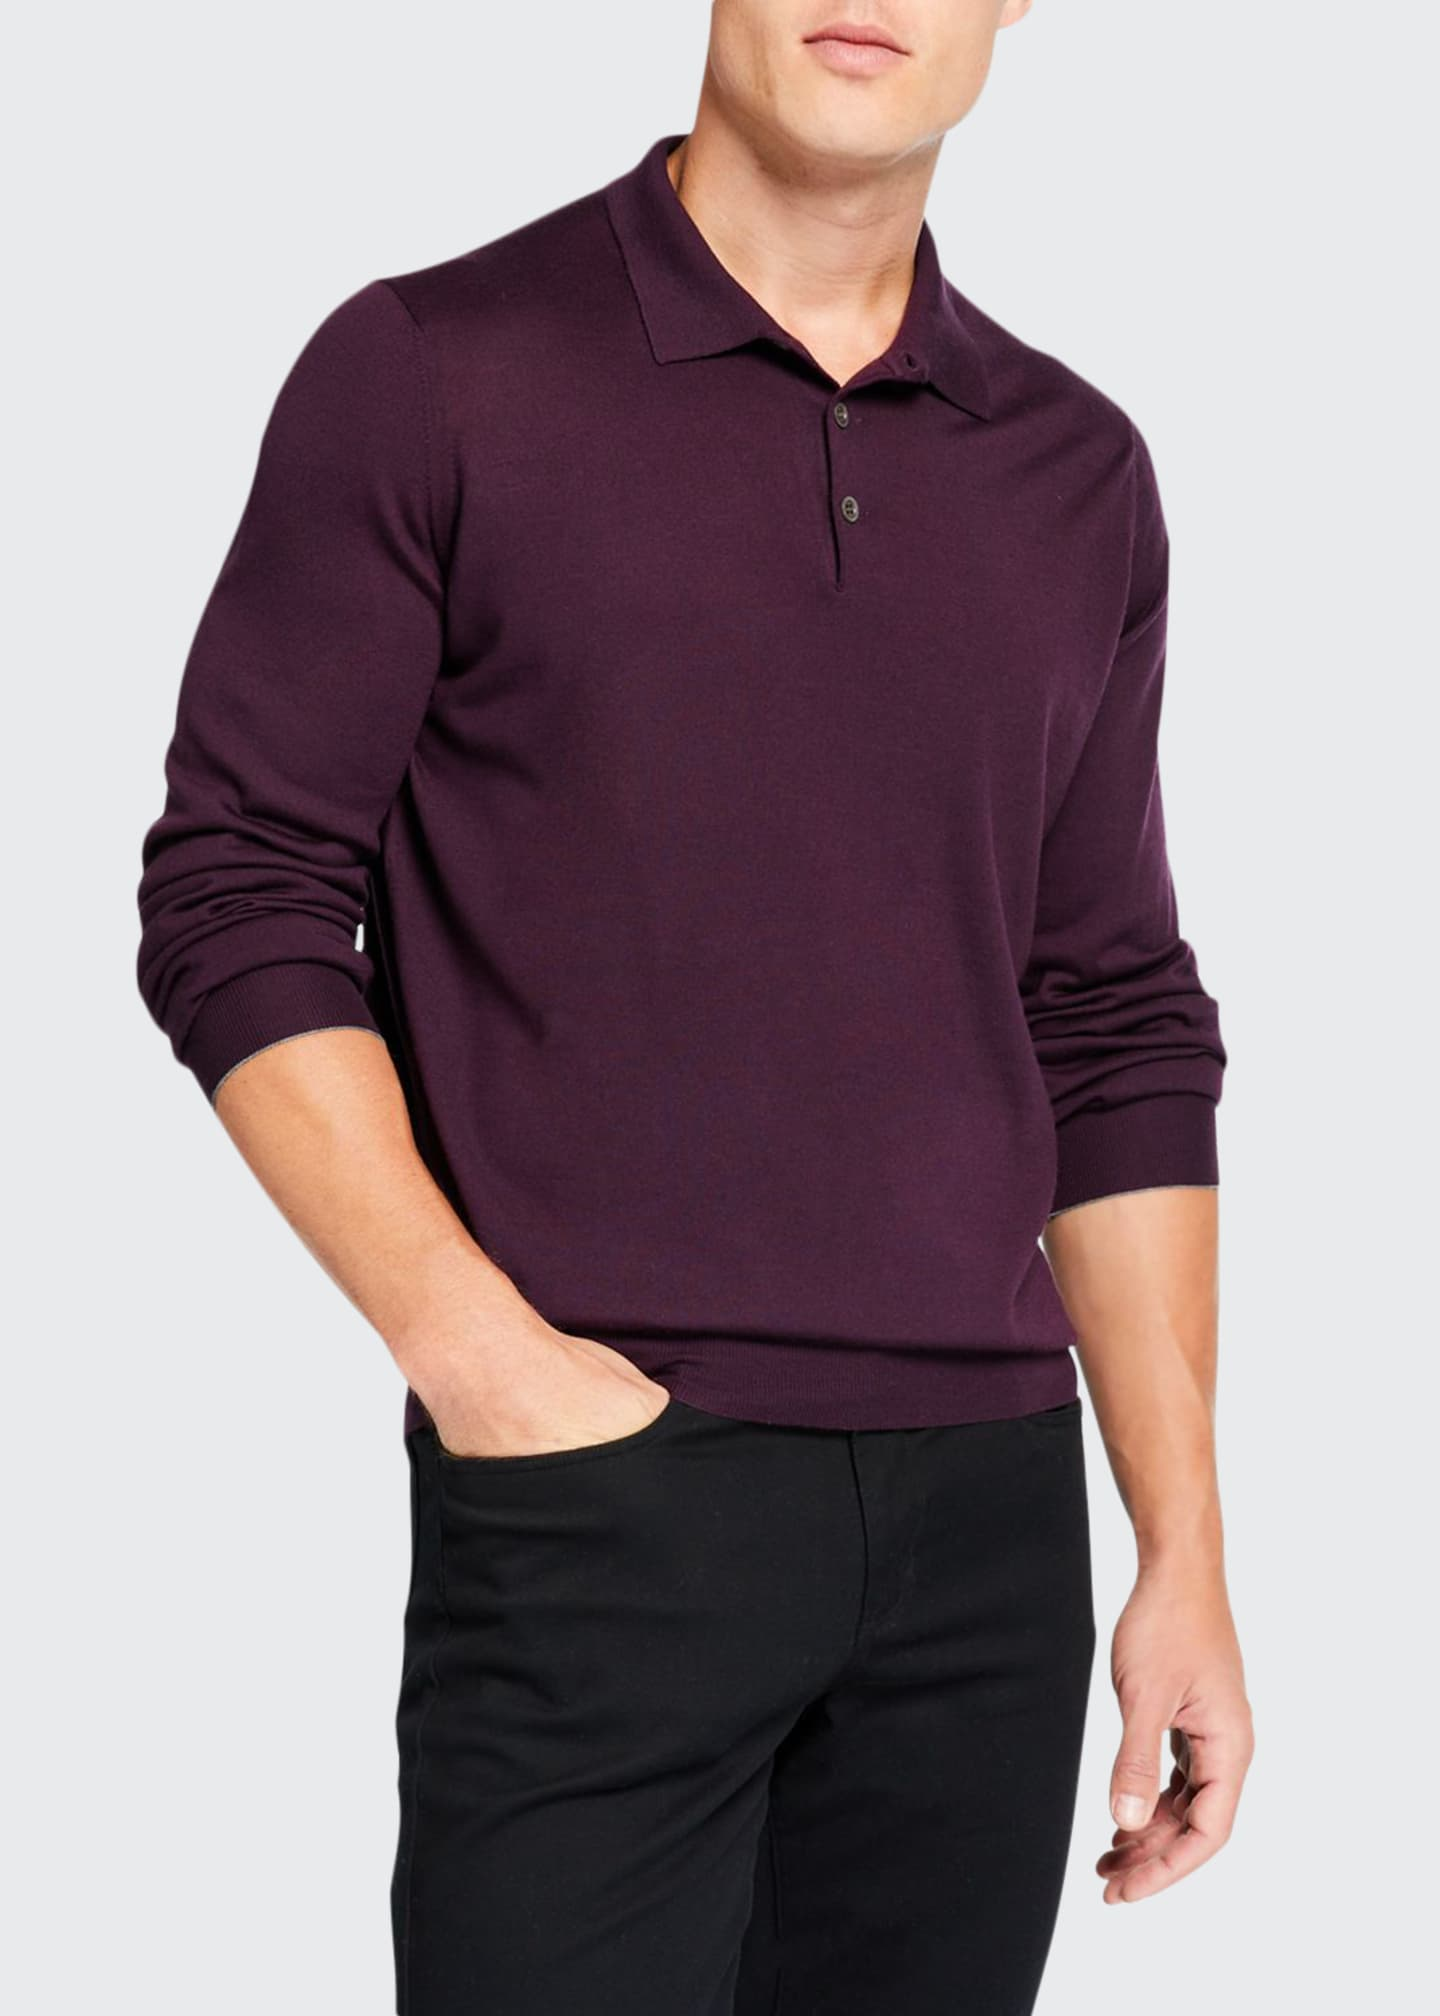 Brunello Cucinelli Men's Solid Wool-Cashmere Polo Sweater